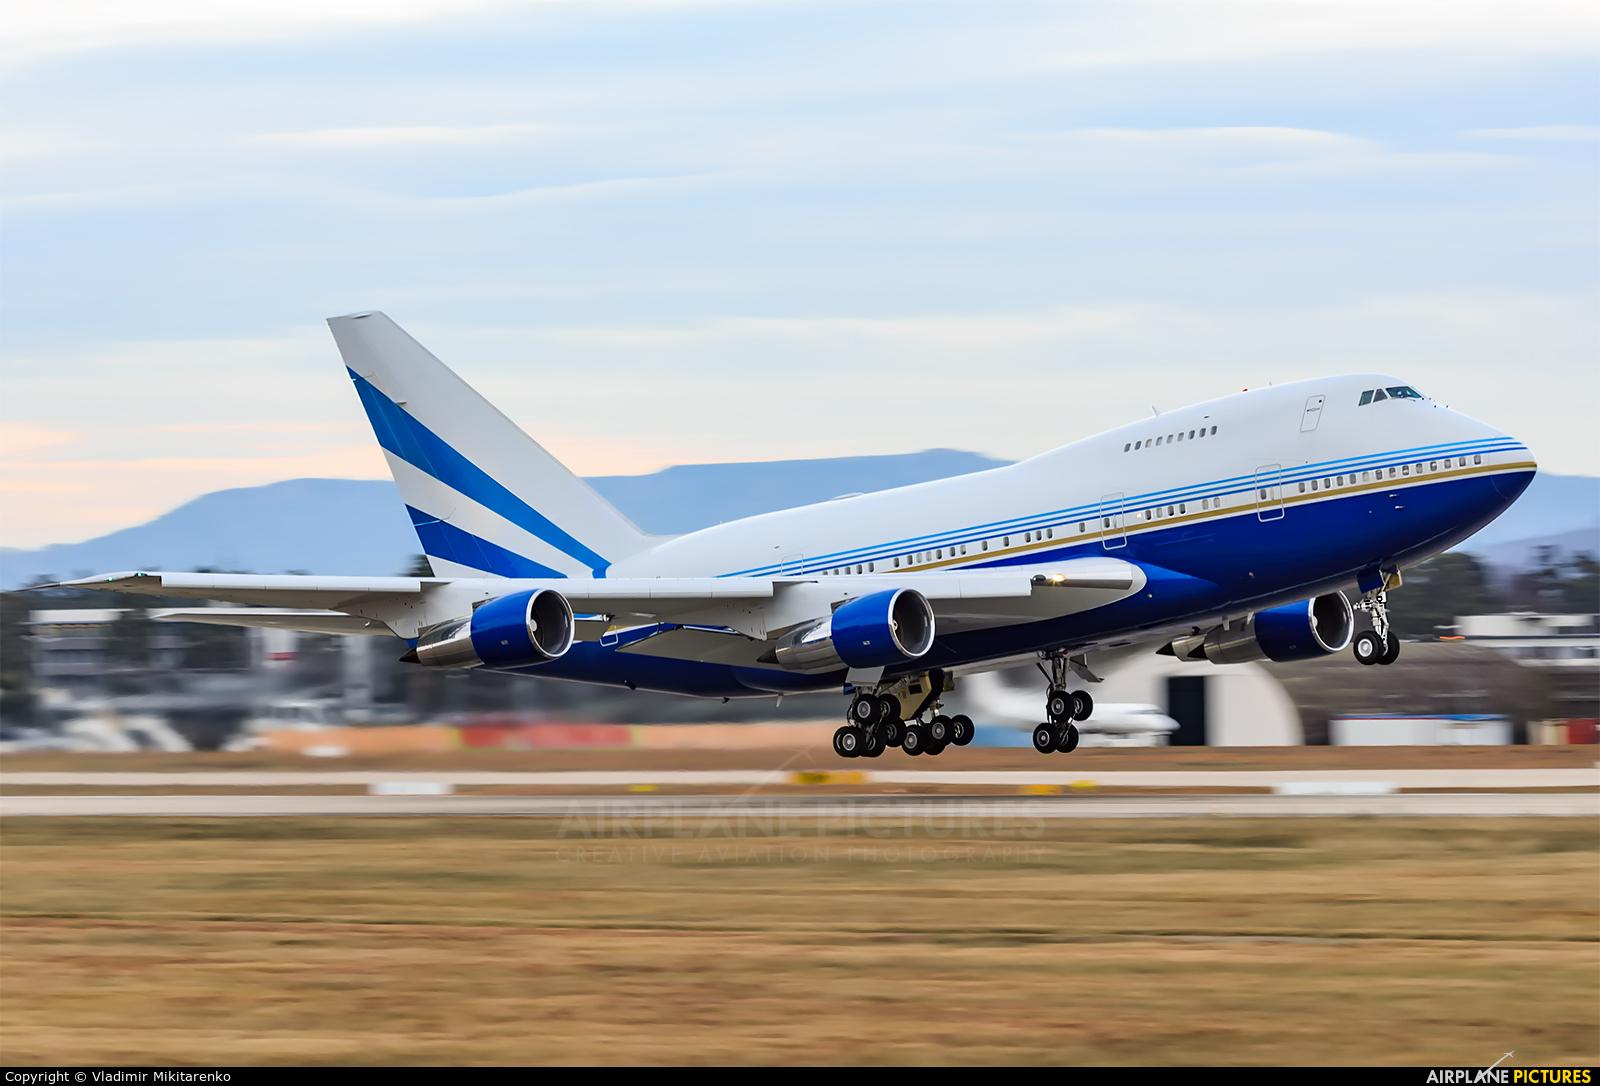 Las Vegas Sands VP-BLK aircraft at Karlsruhe Baden-Baden